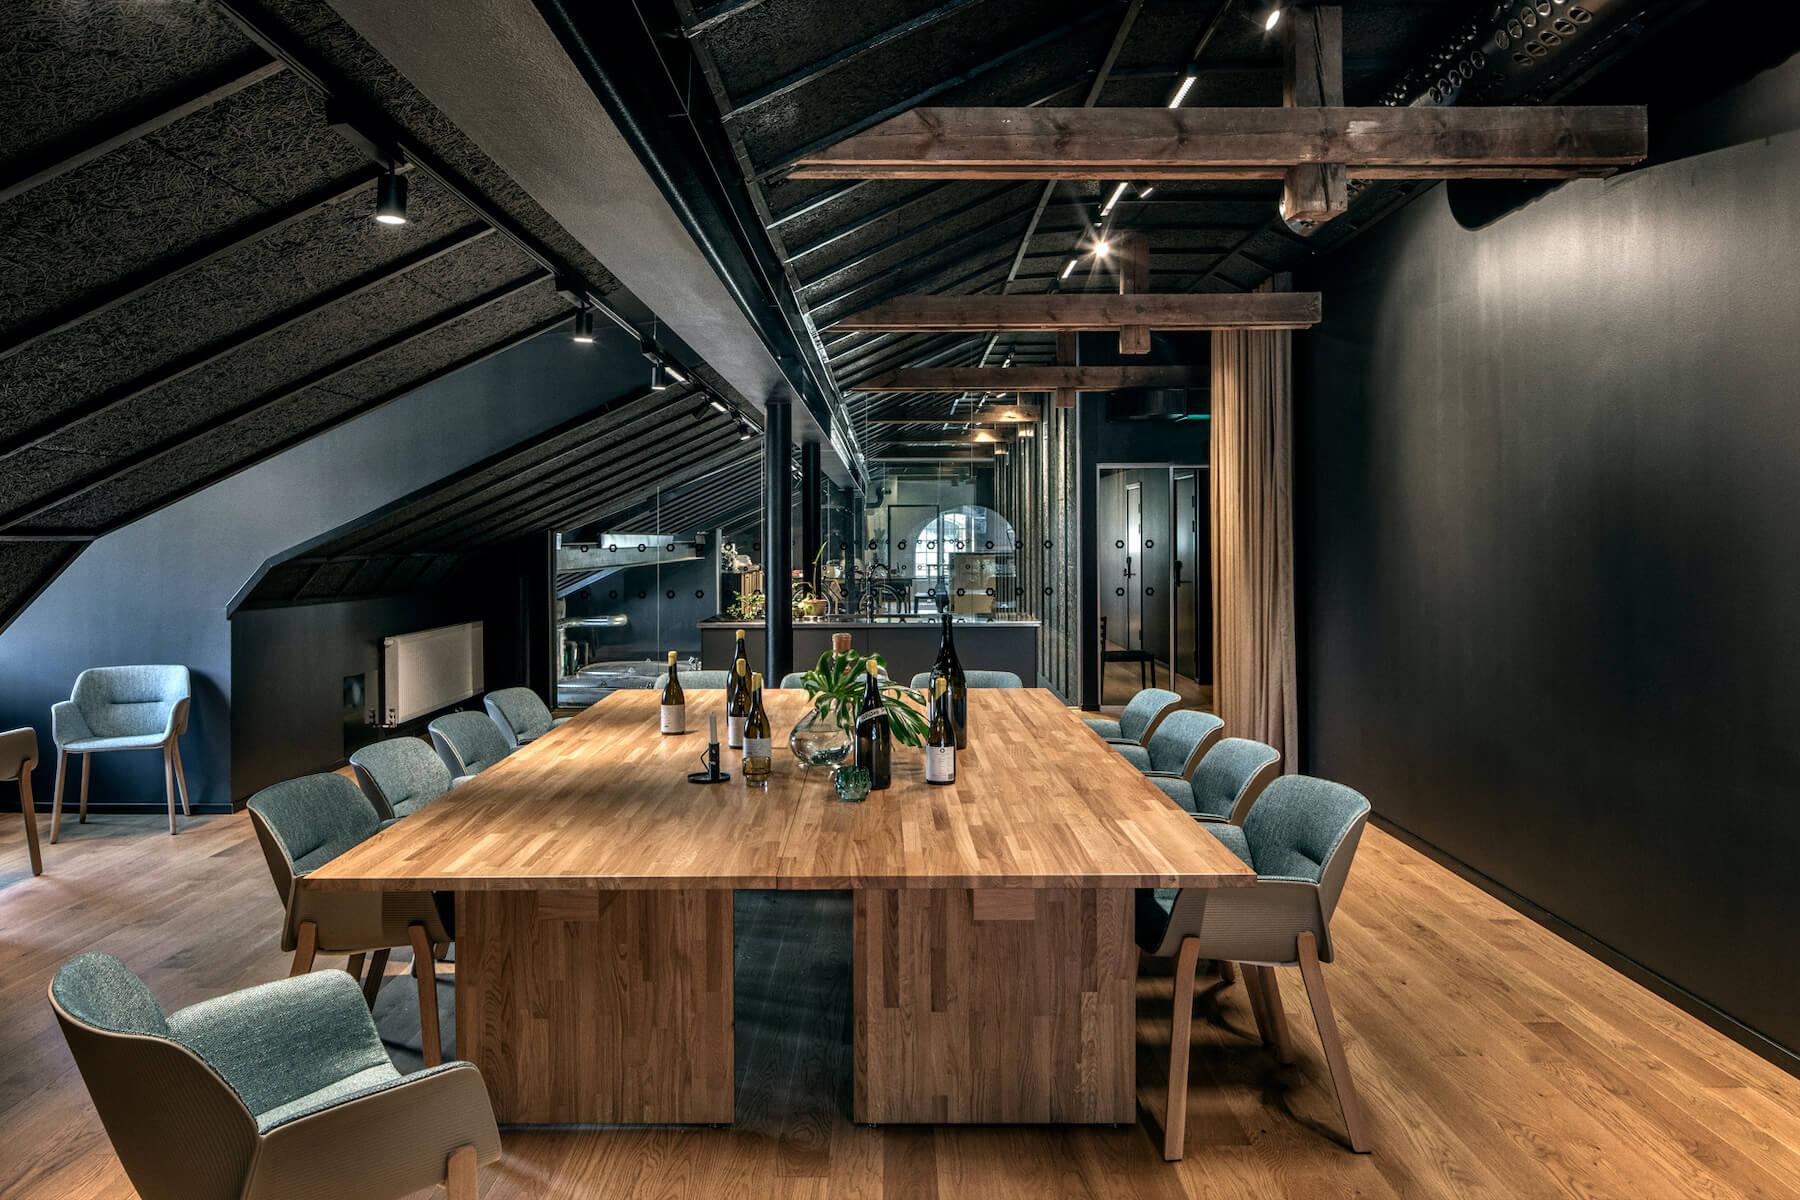 Wine mechanics tasting loft seating arrangement